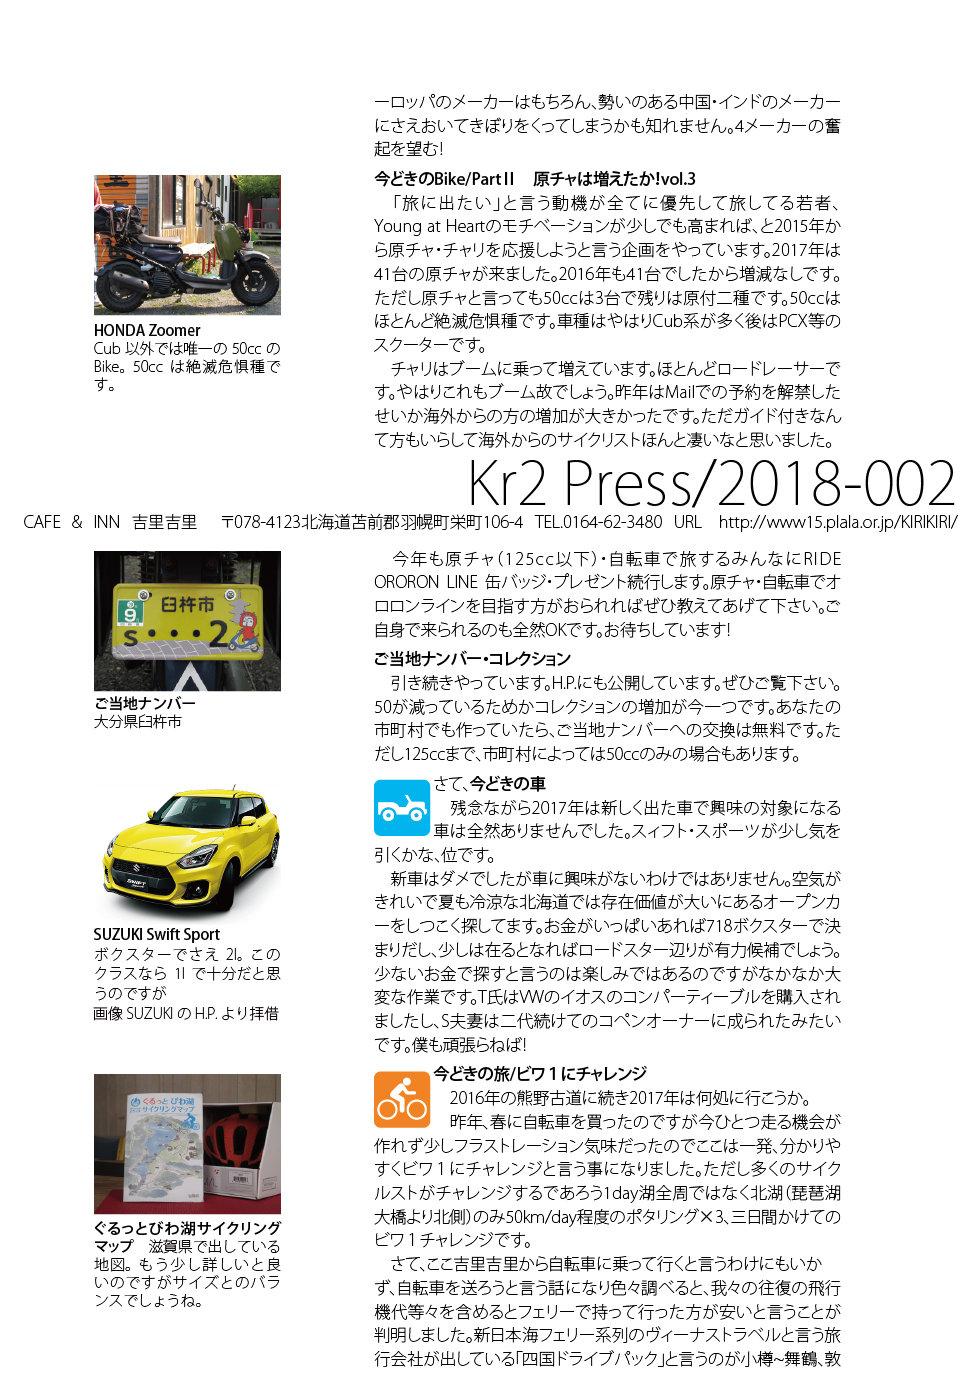 2018Kr2Press02.jpg